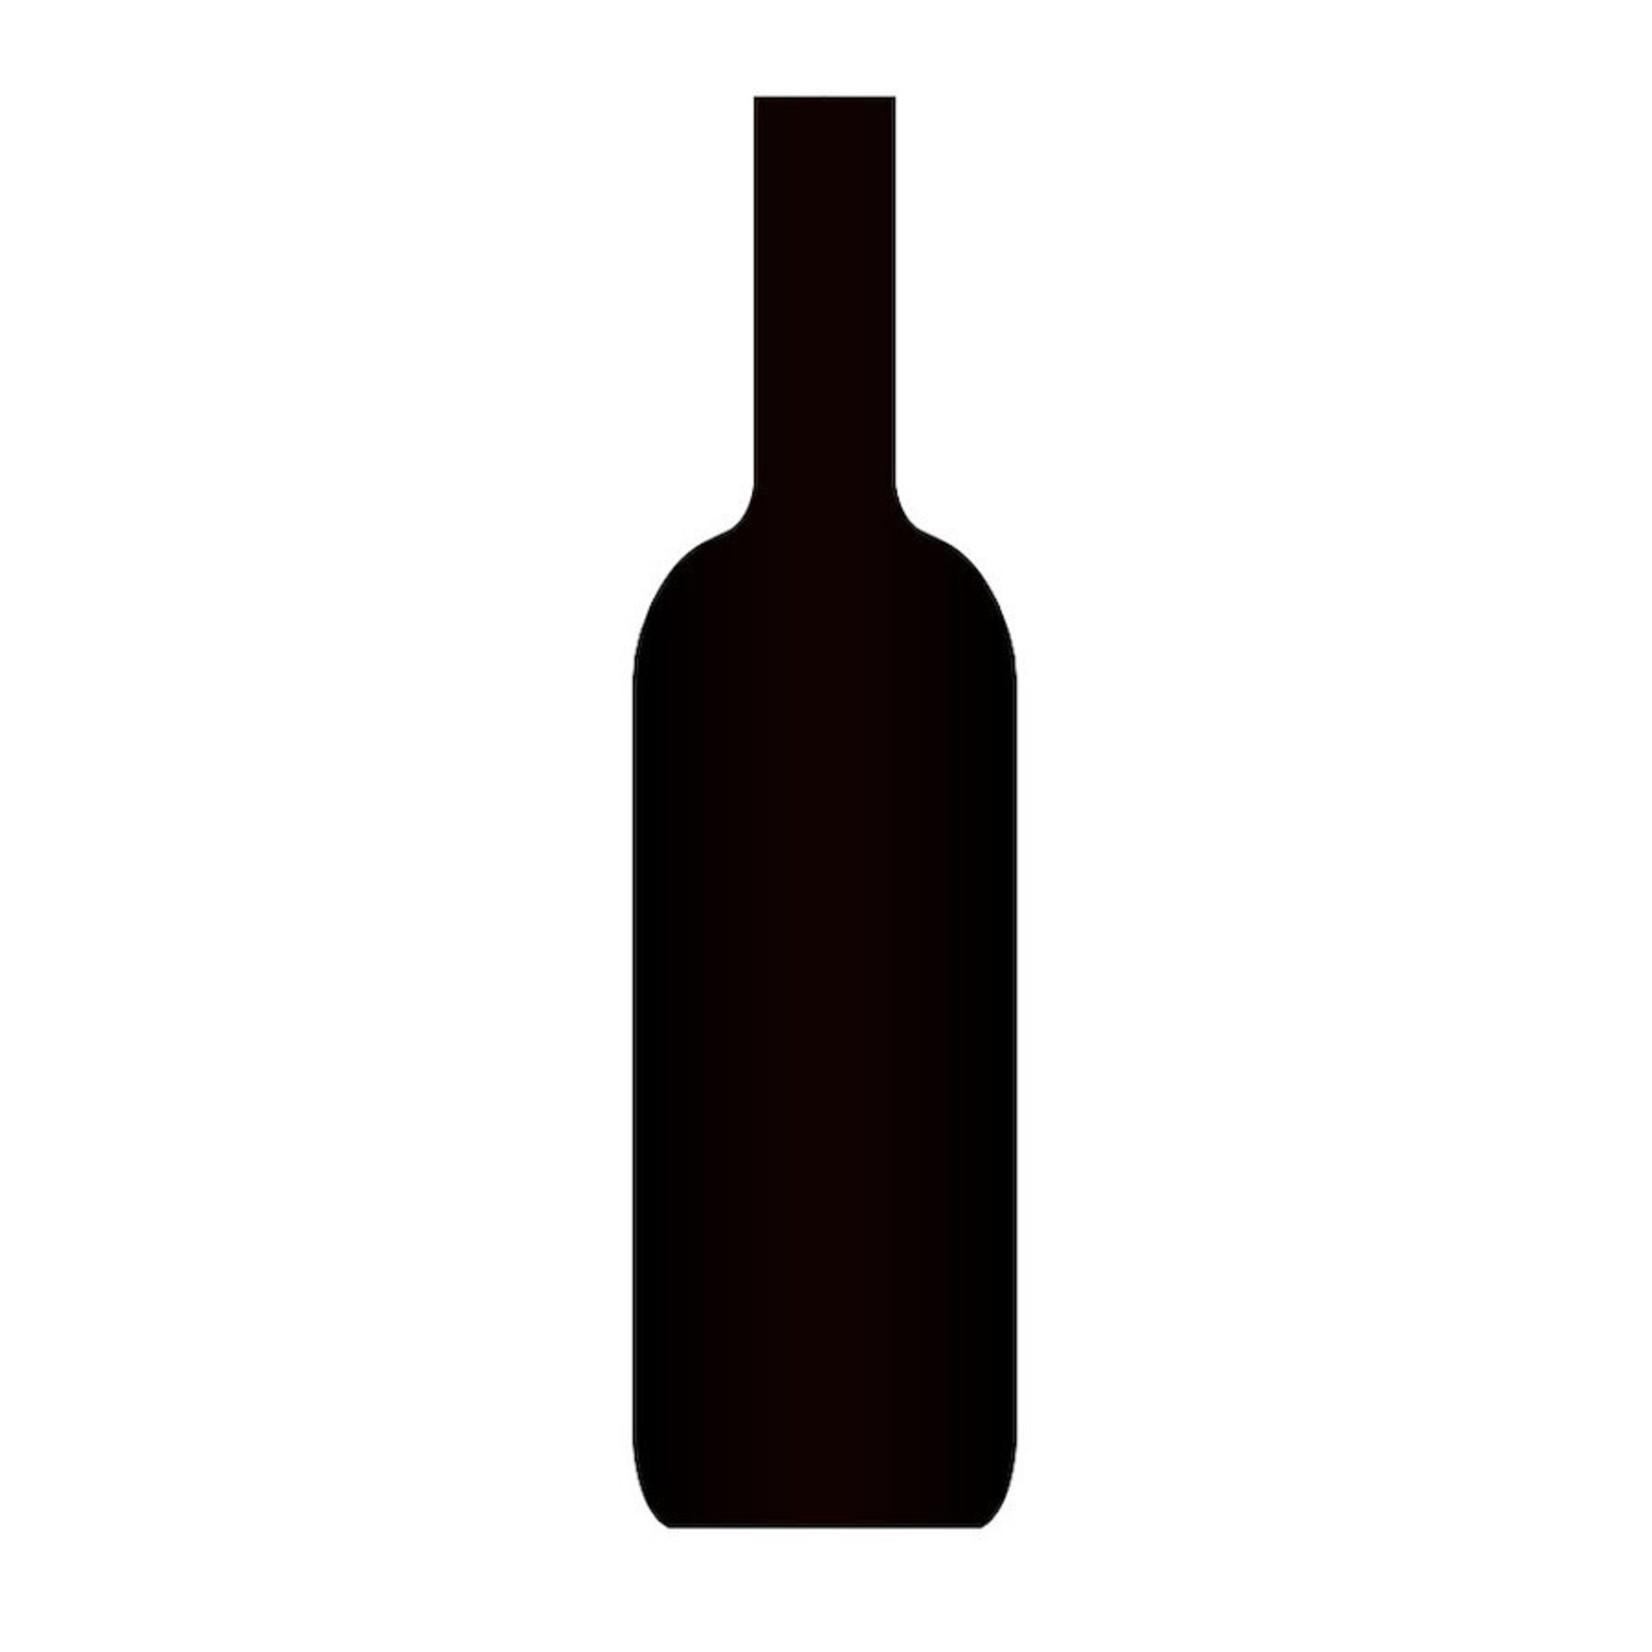 2018 Tether Cabernet Sauvignon